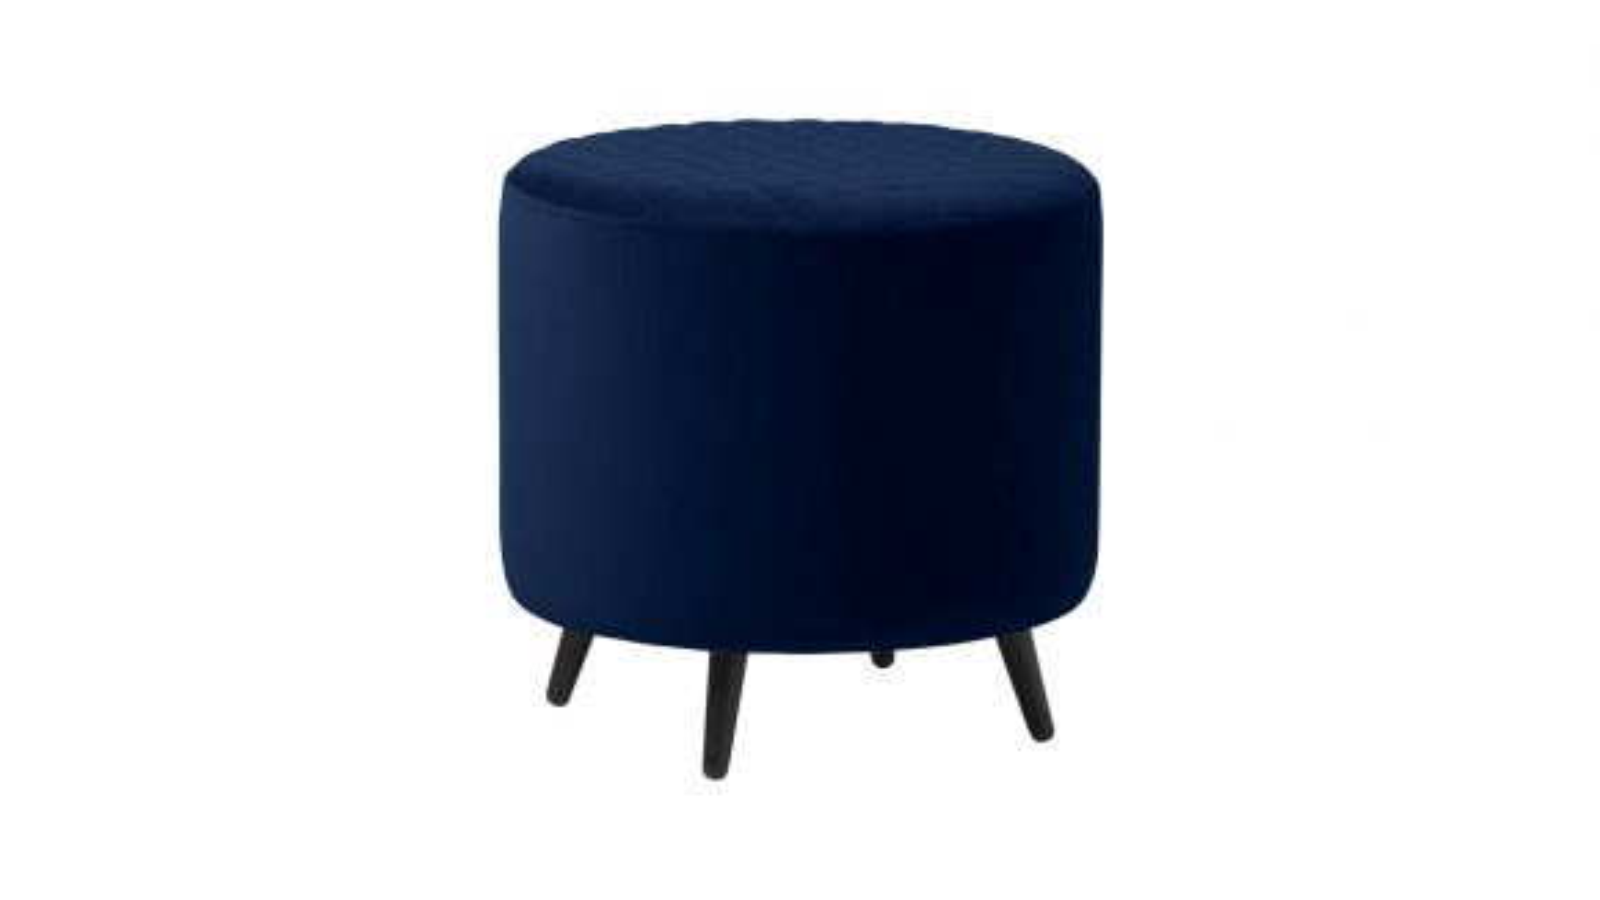 Taburet Ottowa blue velvet